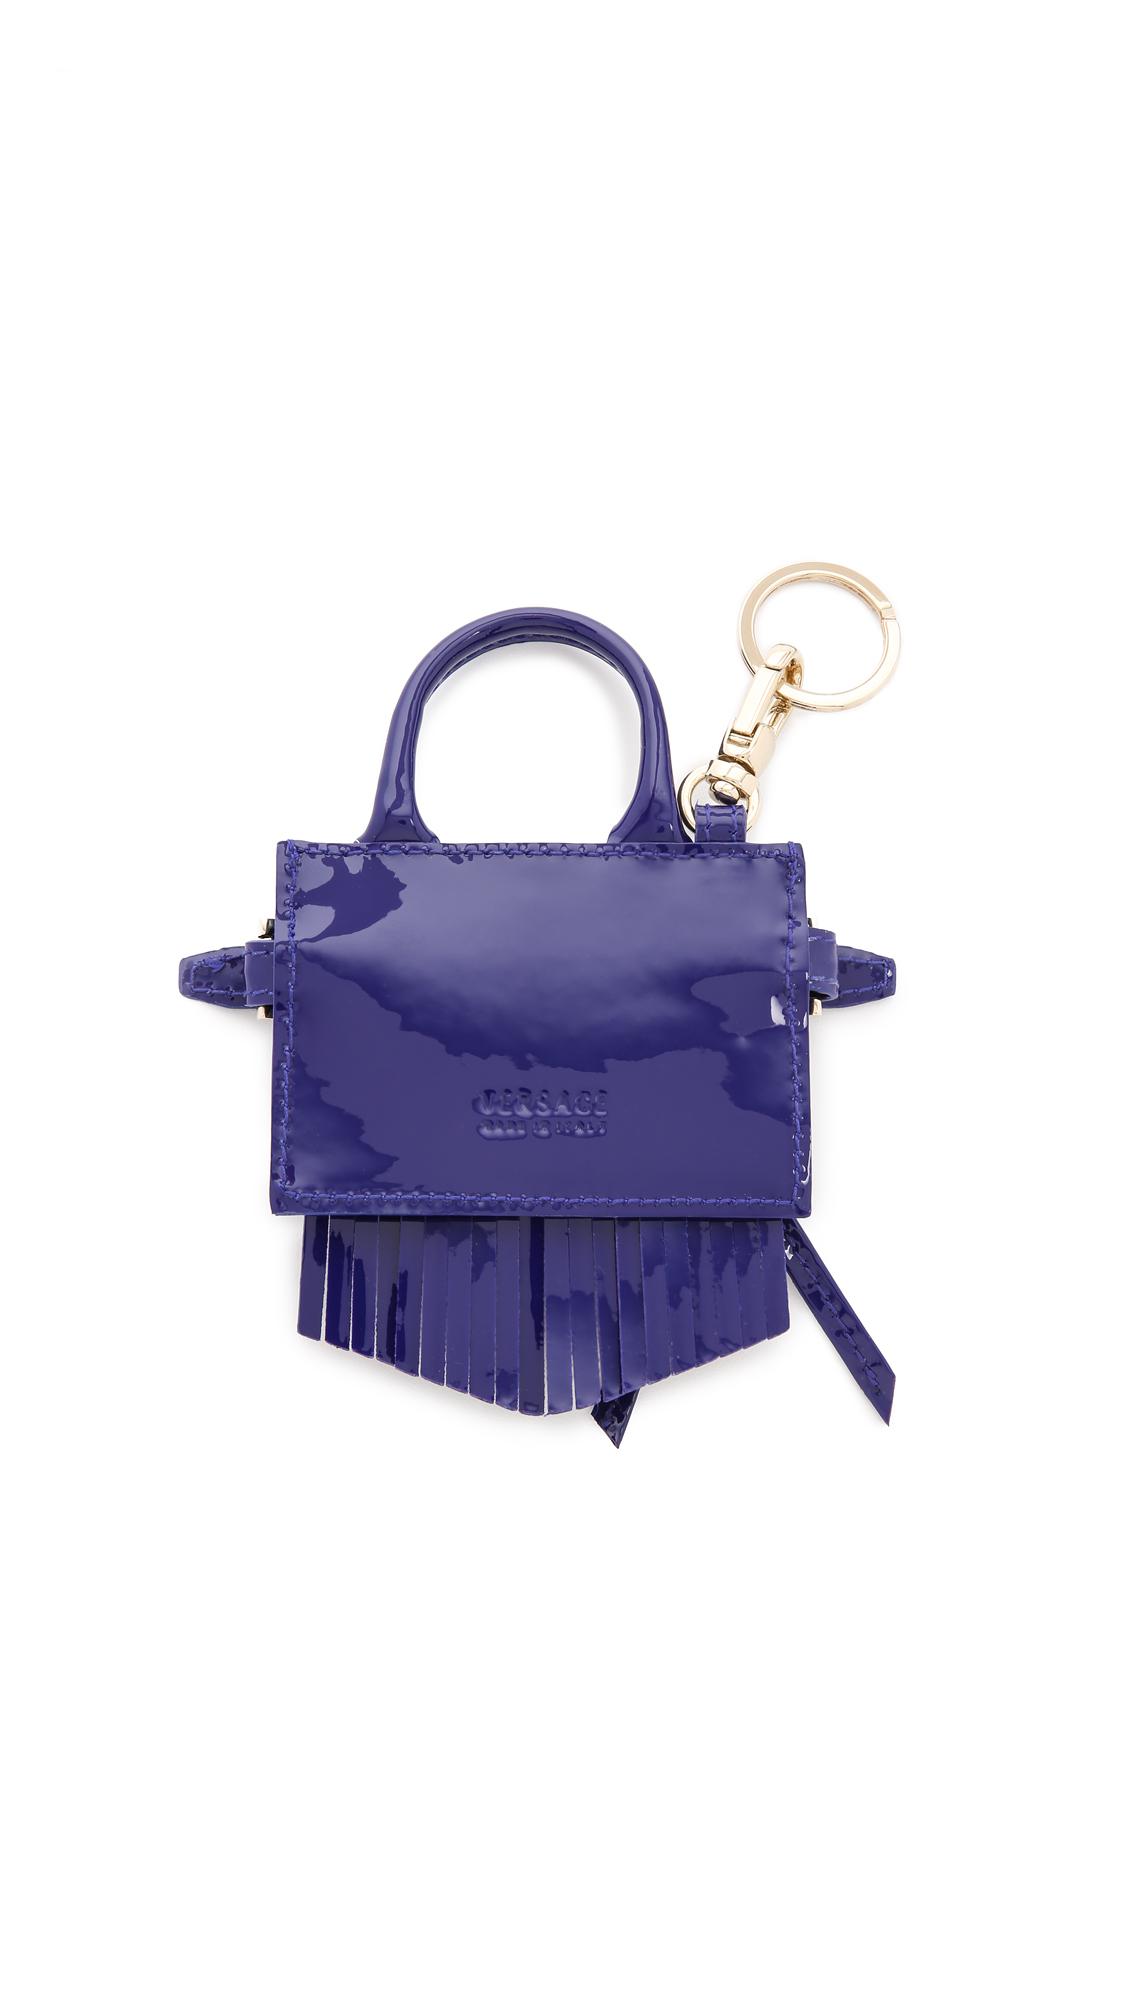 Versace Mini Handbag Keychain   SHOPBOP 8466af9f09